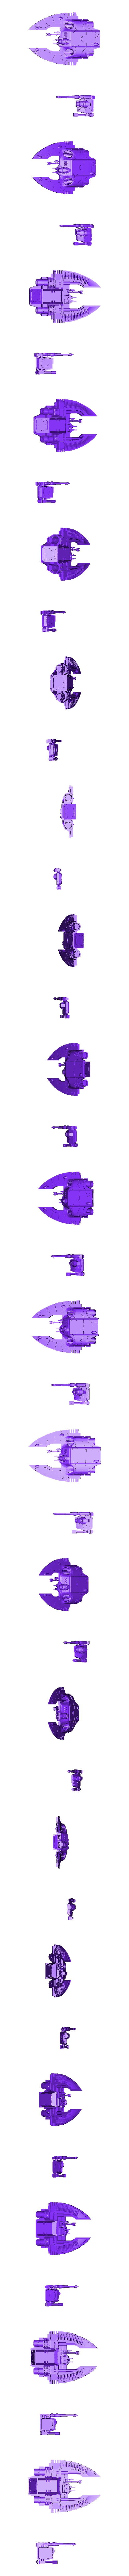 SpaceElfFloatingTankEpicCommunitytestmeshVersion10.stl Download free STL file Space Elf Tank For Resin Print • 3D printing model, barnEbiss2